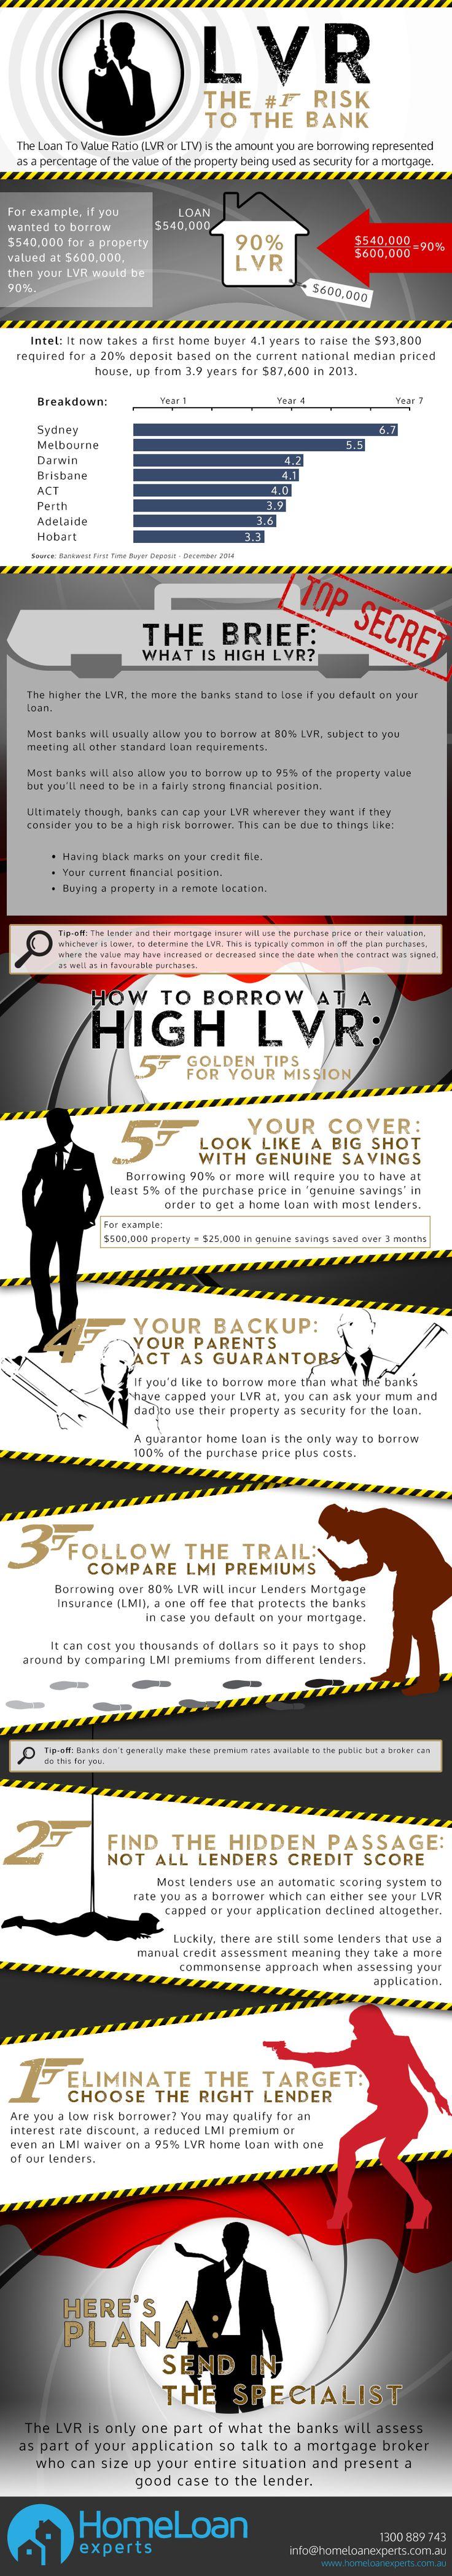 5 Ways To Borrow At A High LVR